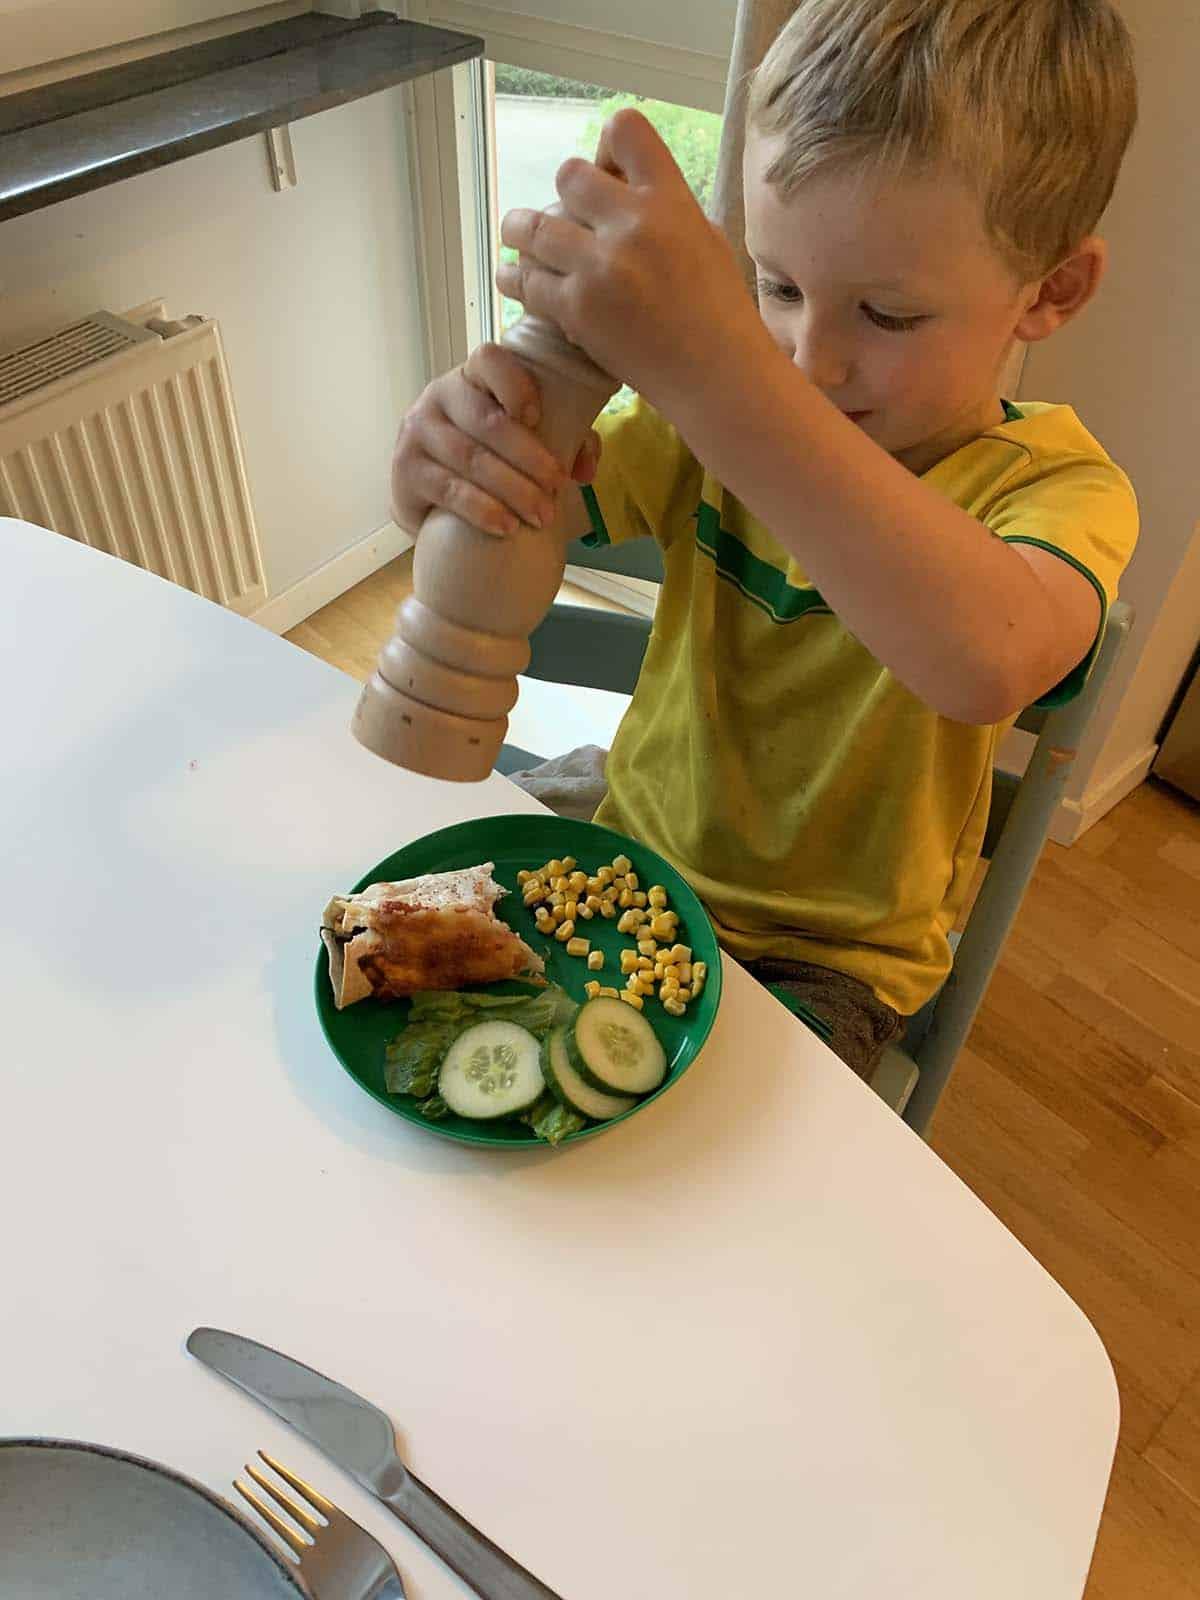 A boy in a yellow shirt holding a wooden pepper grinder